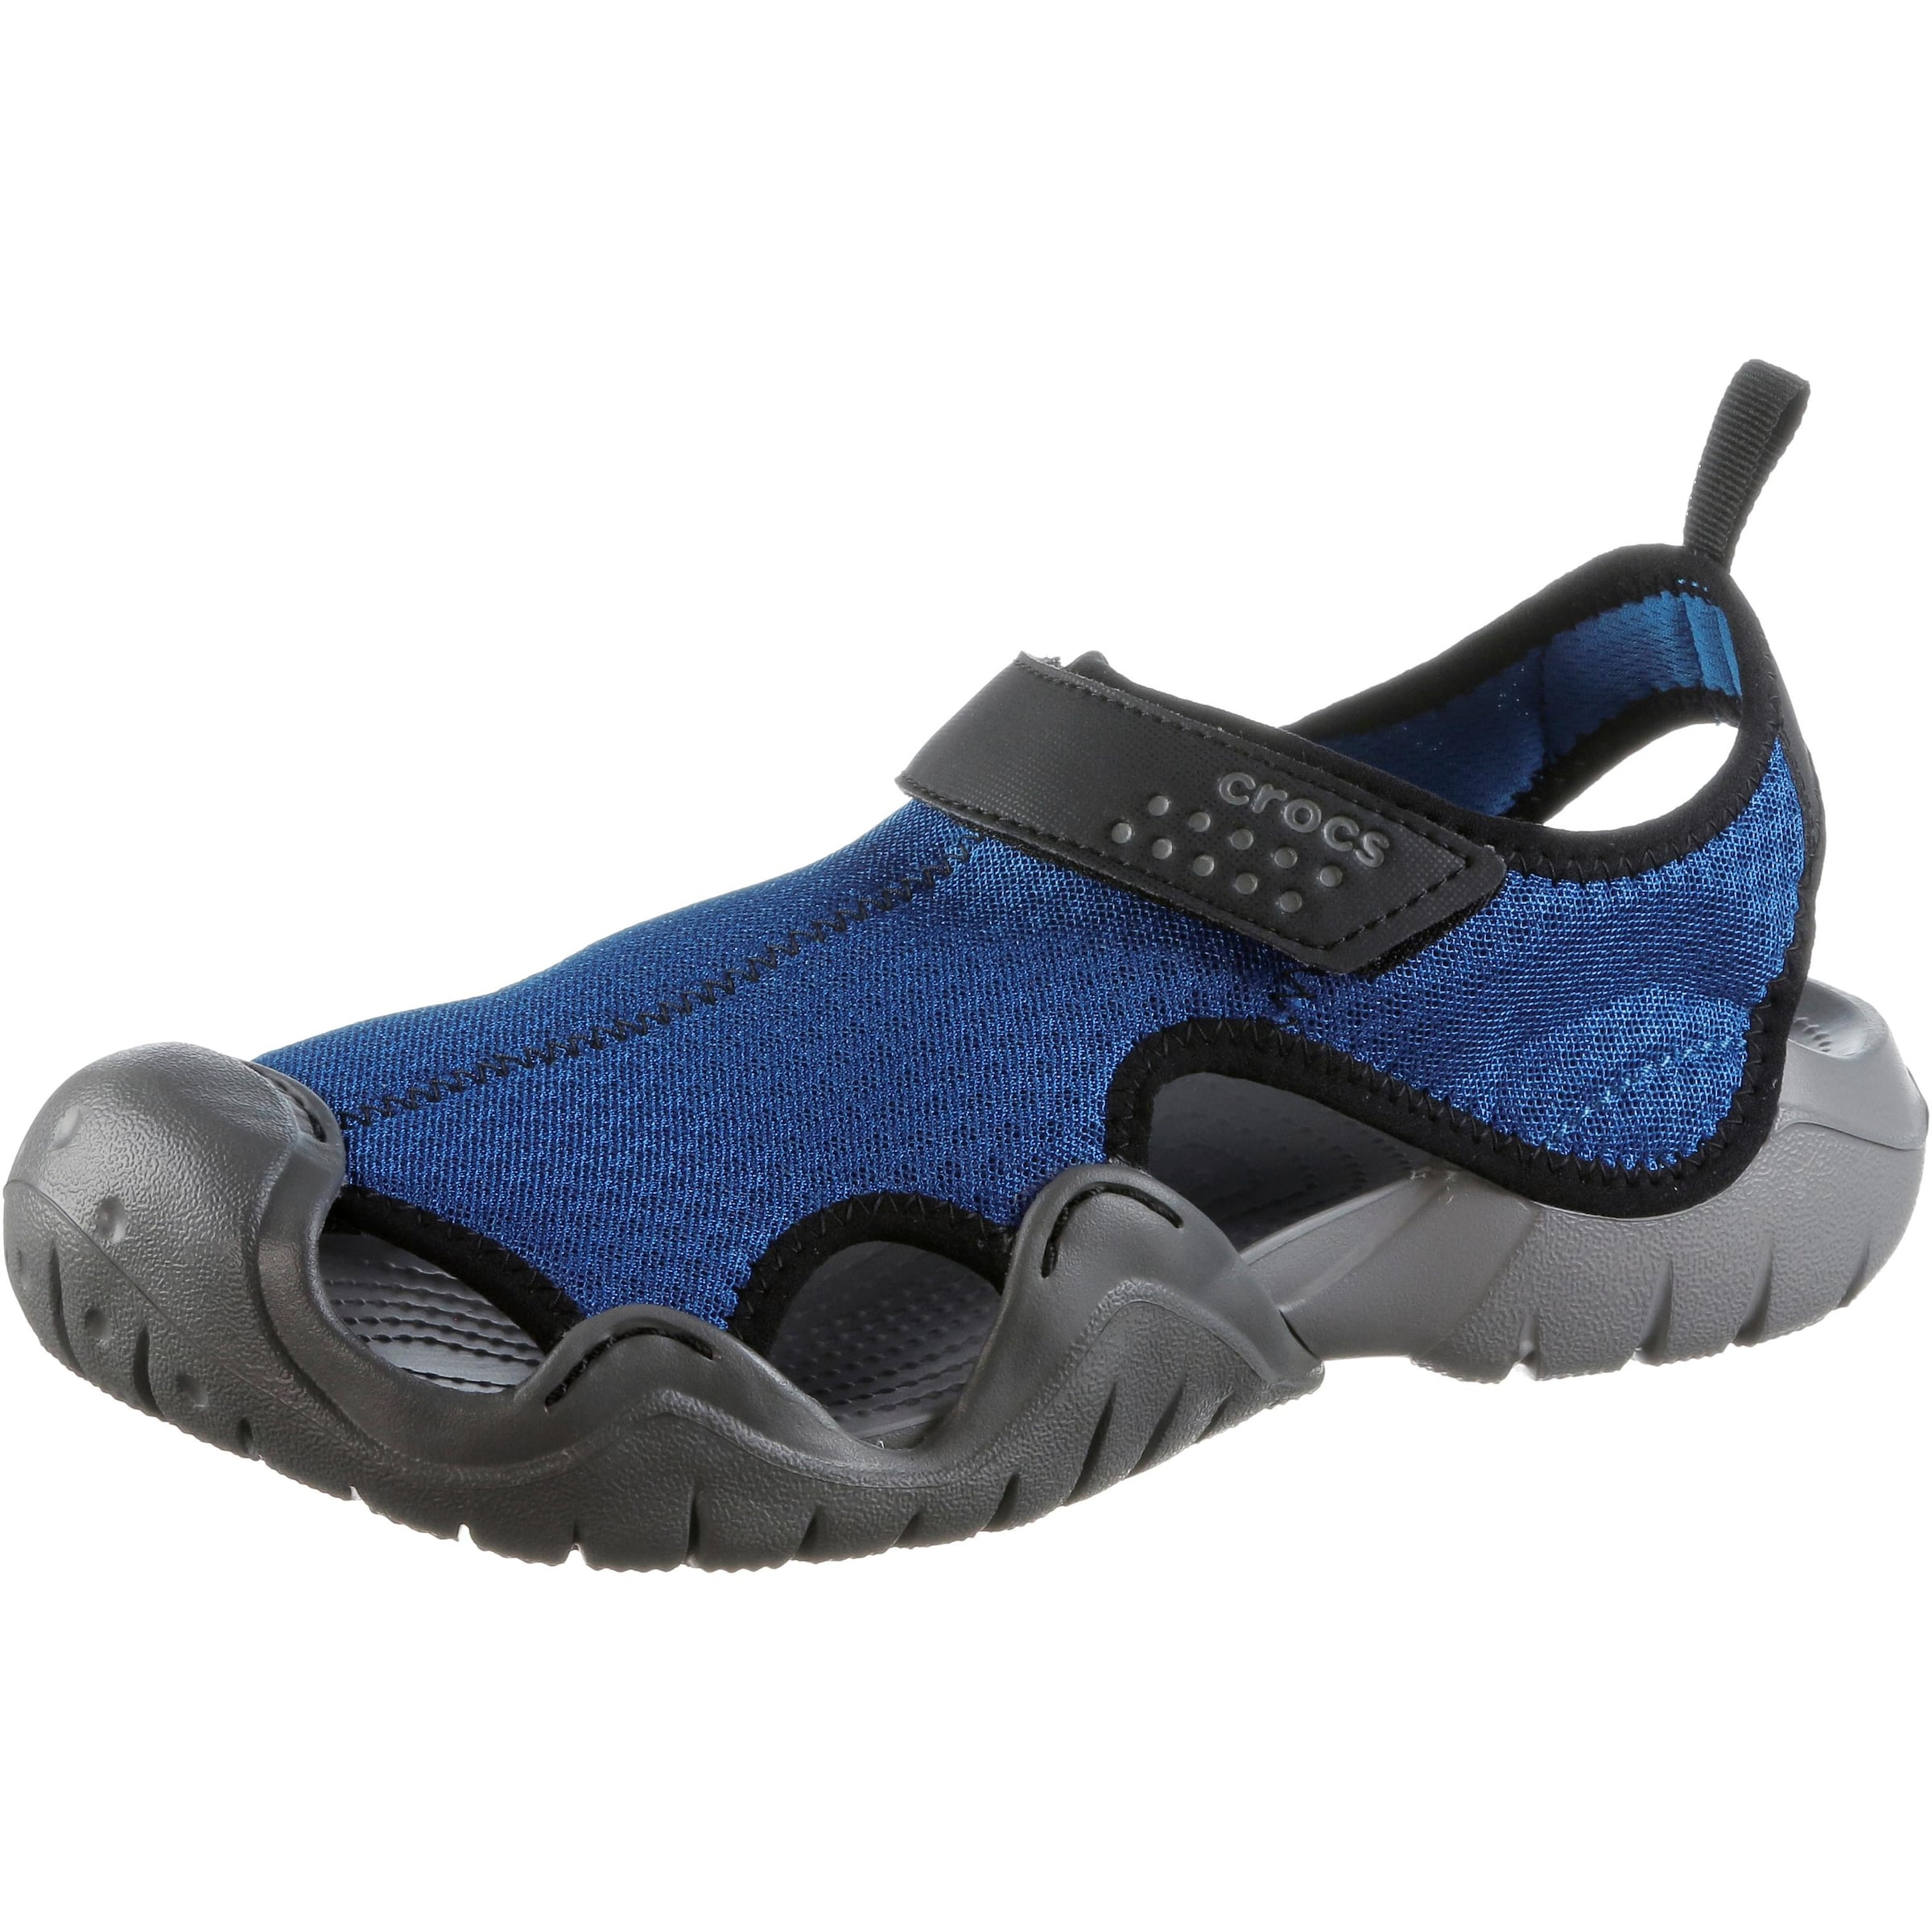 M' 'swiftwater Sandale Crocs In Sandal BlauGraphit mN0nOvwPy8